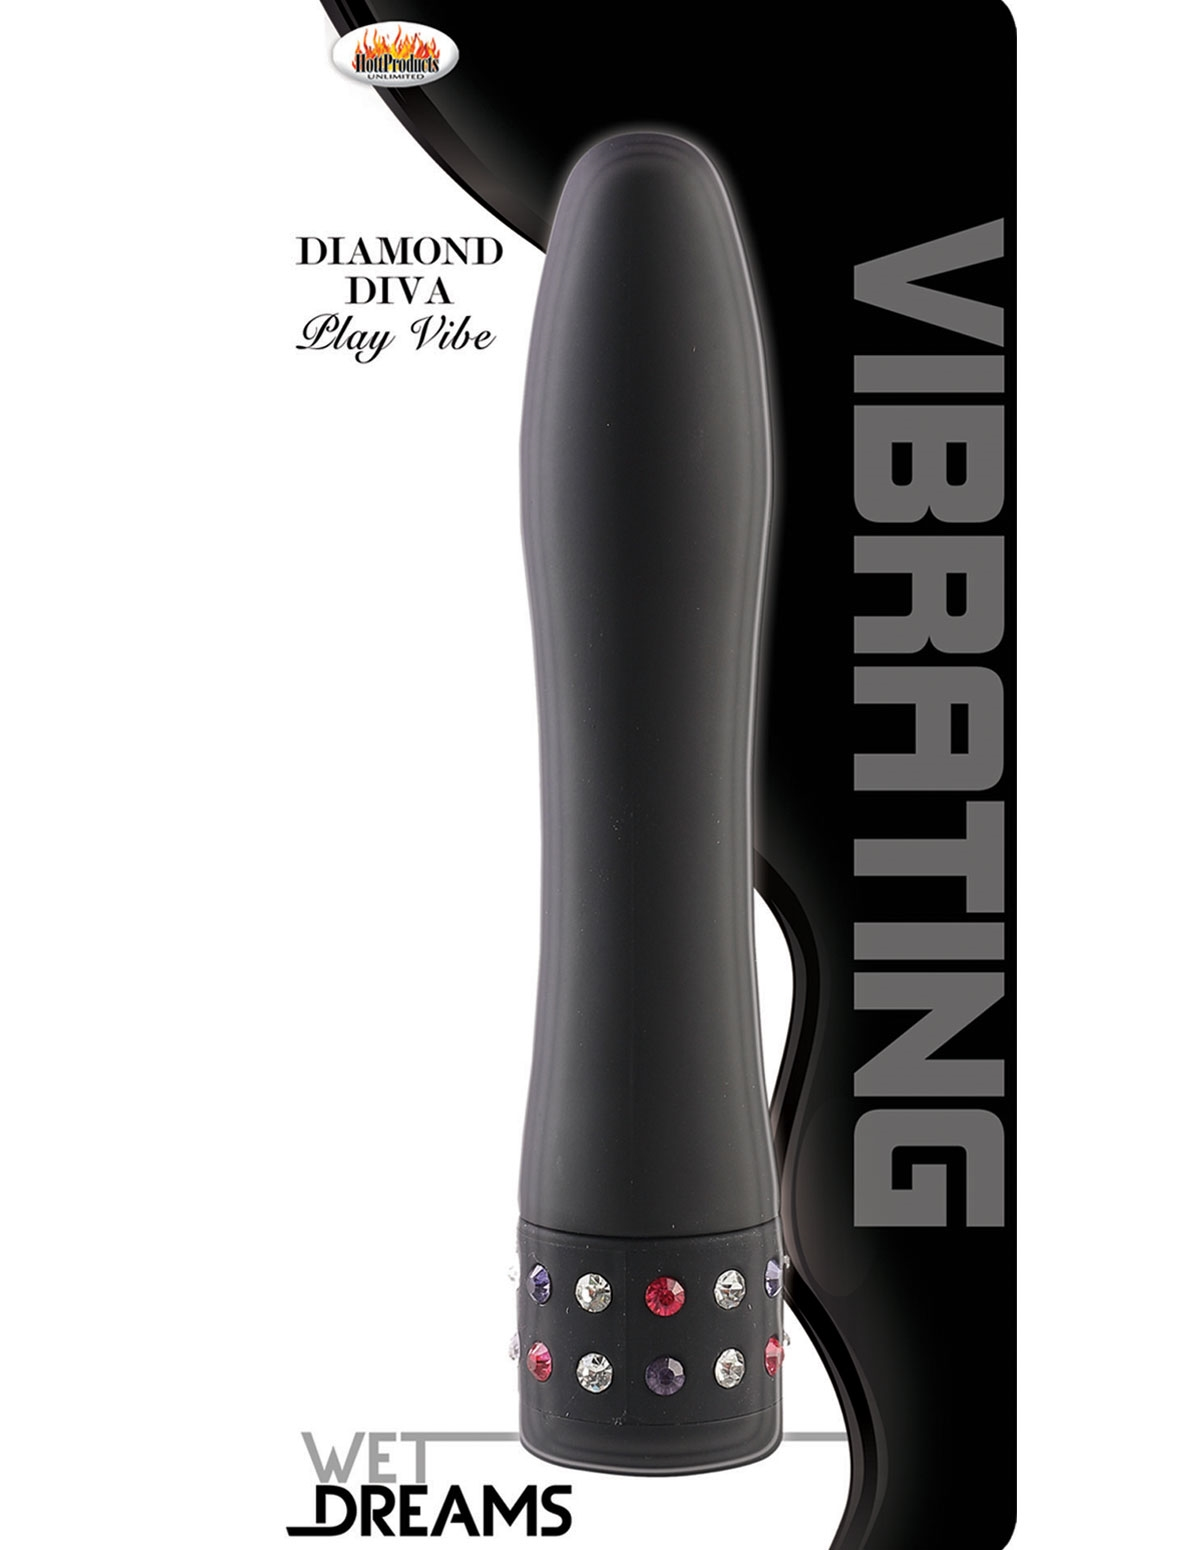 Diamond Diva Vibrator